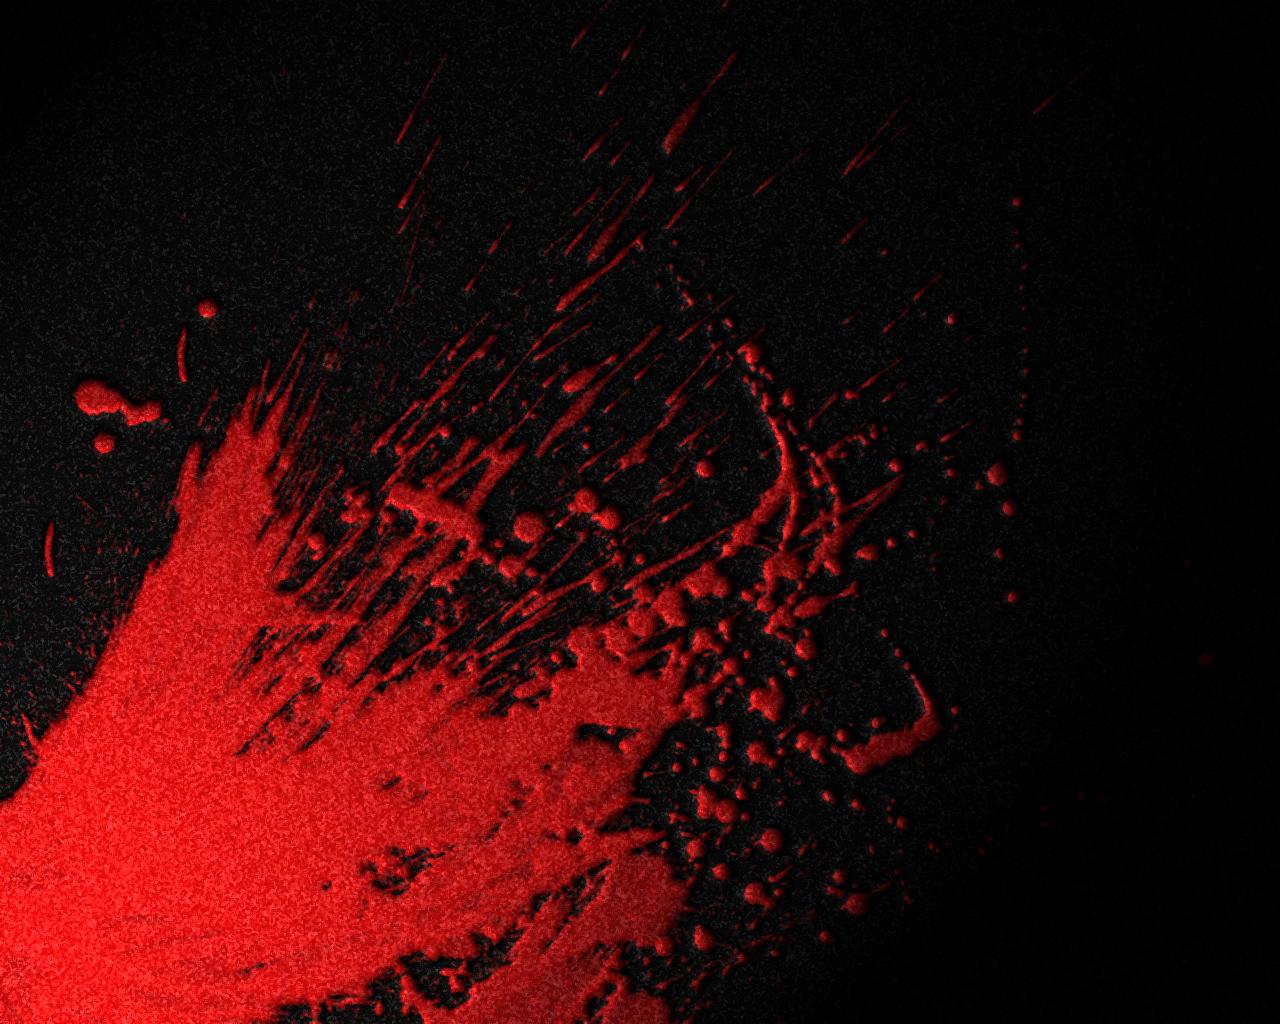 Jogo 01 - Saga de Asgard - A Ameaça Fantasma a Asgard - Página 2 Blood_by_toast_sama